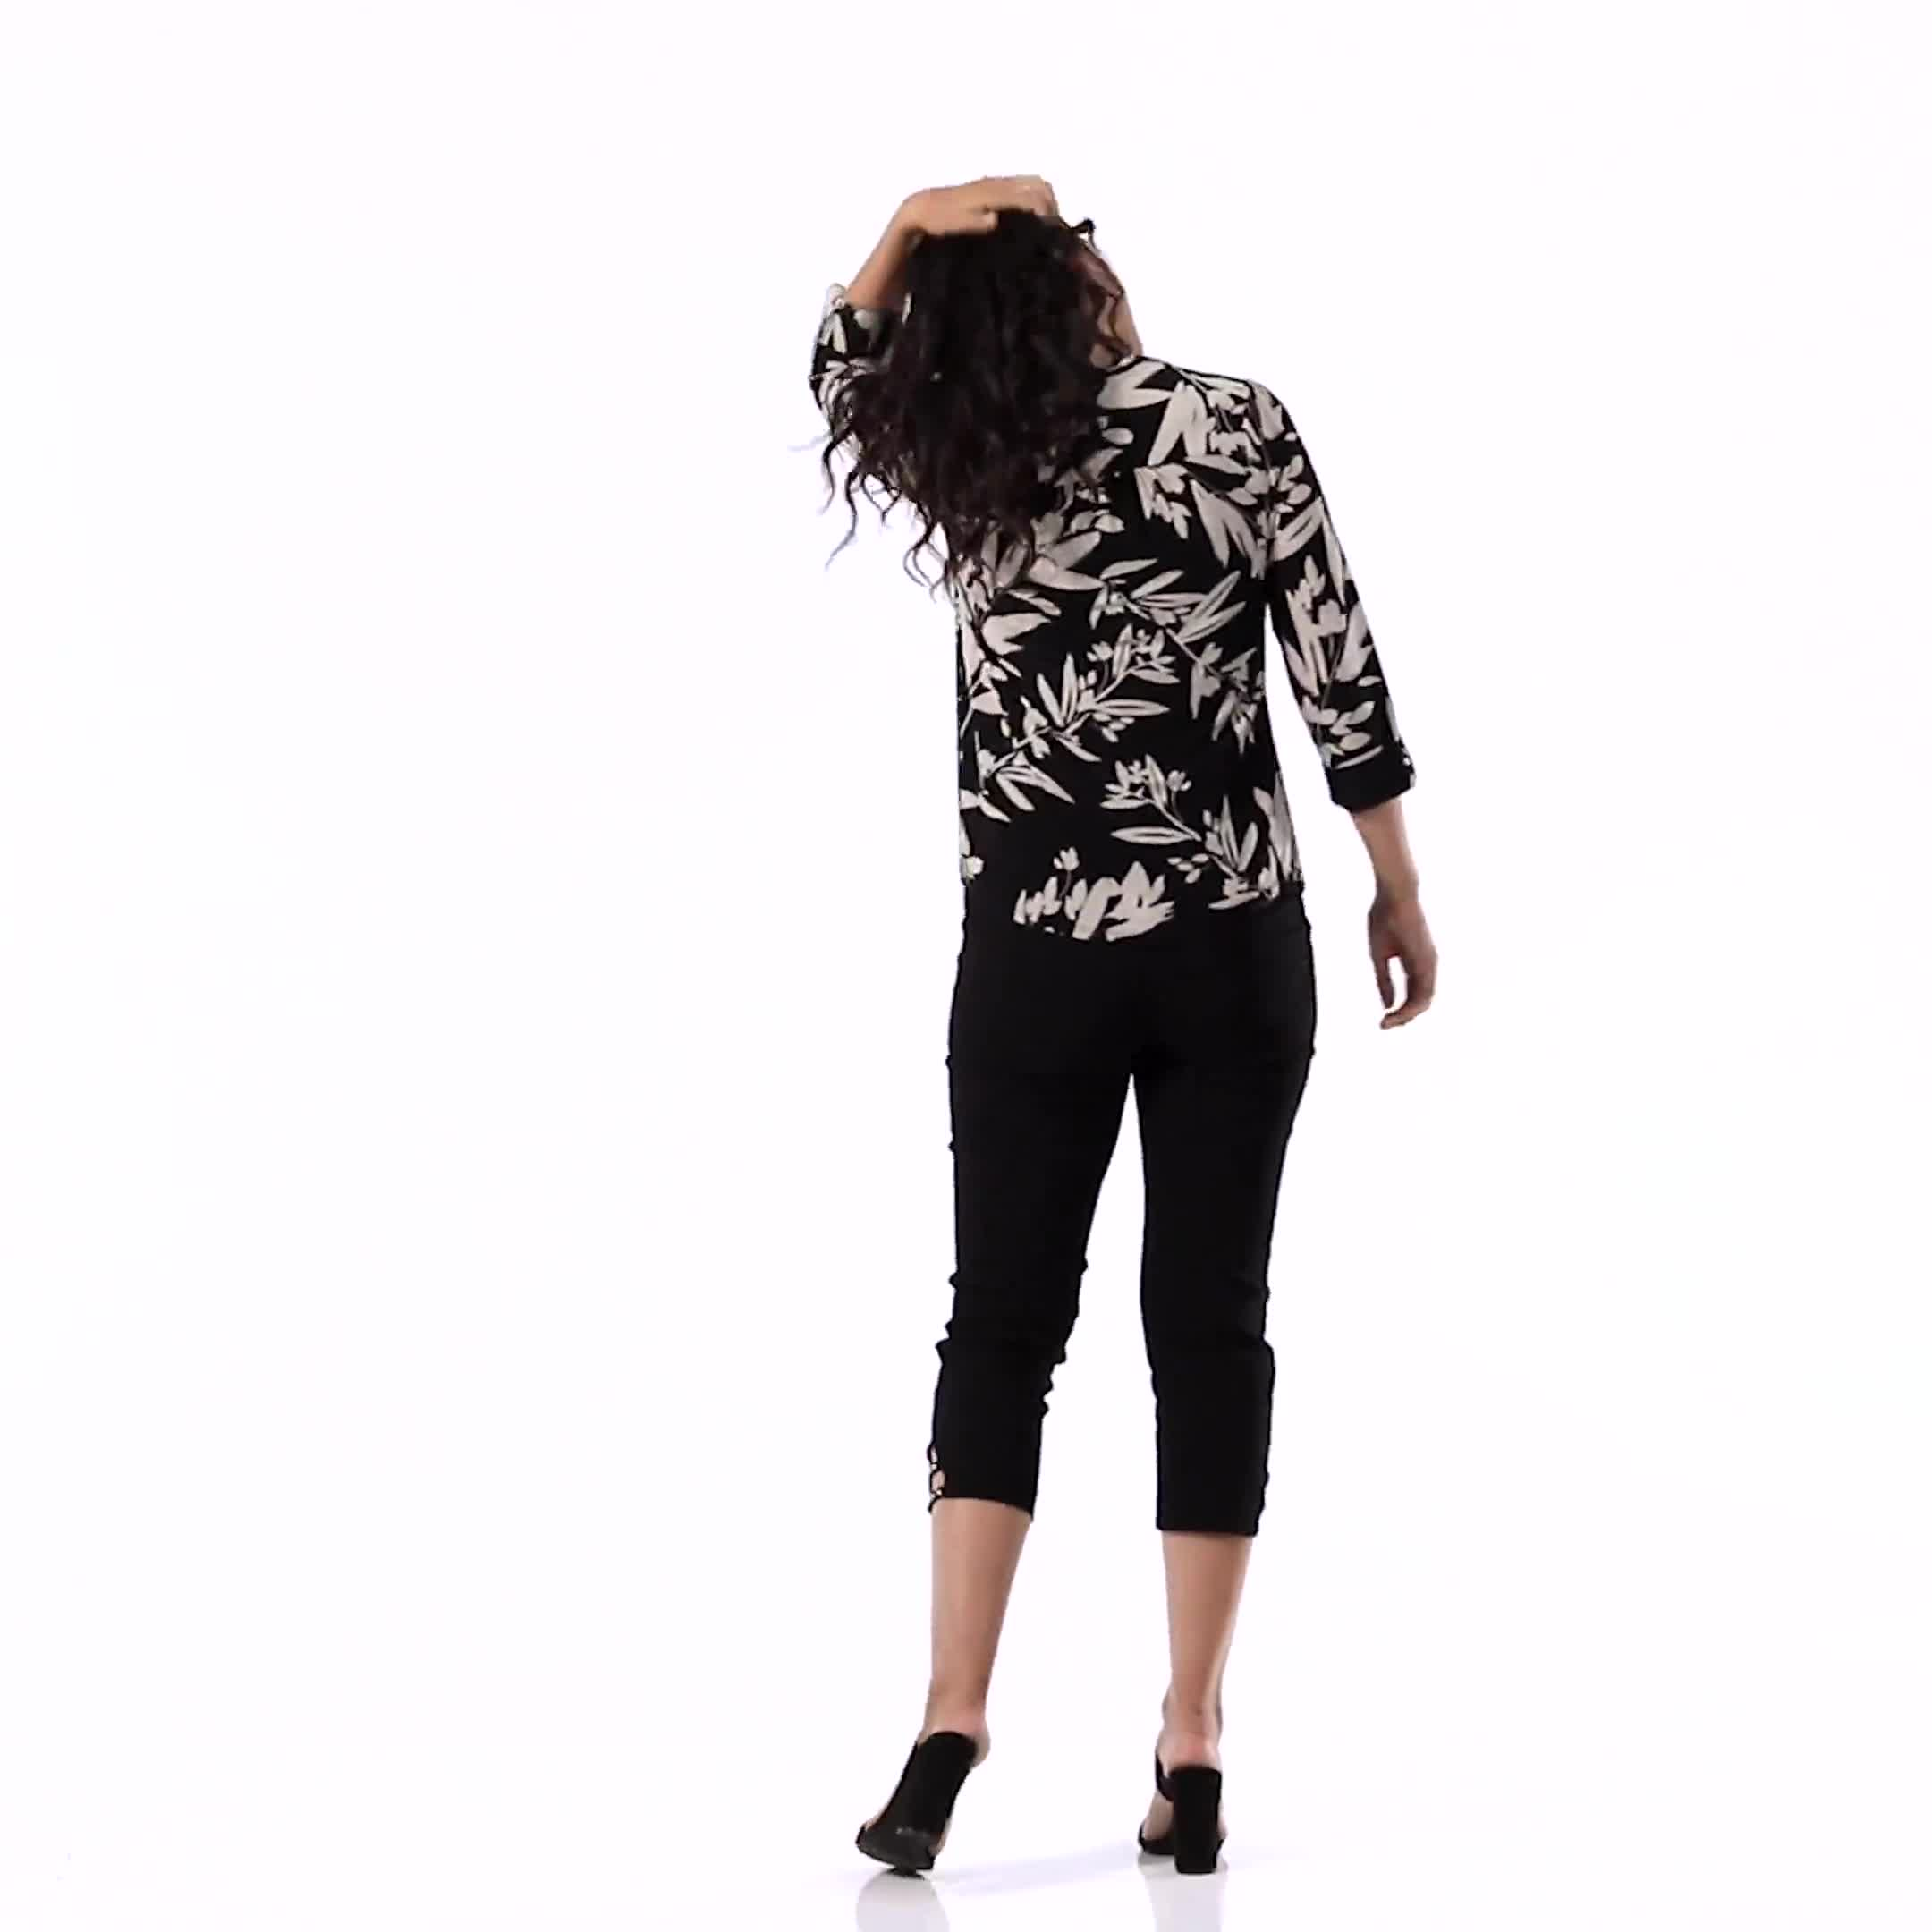 Neutral Vine Floral Knit Popover - Misses - Video